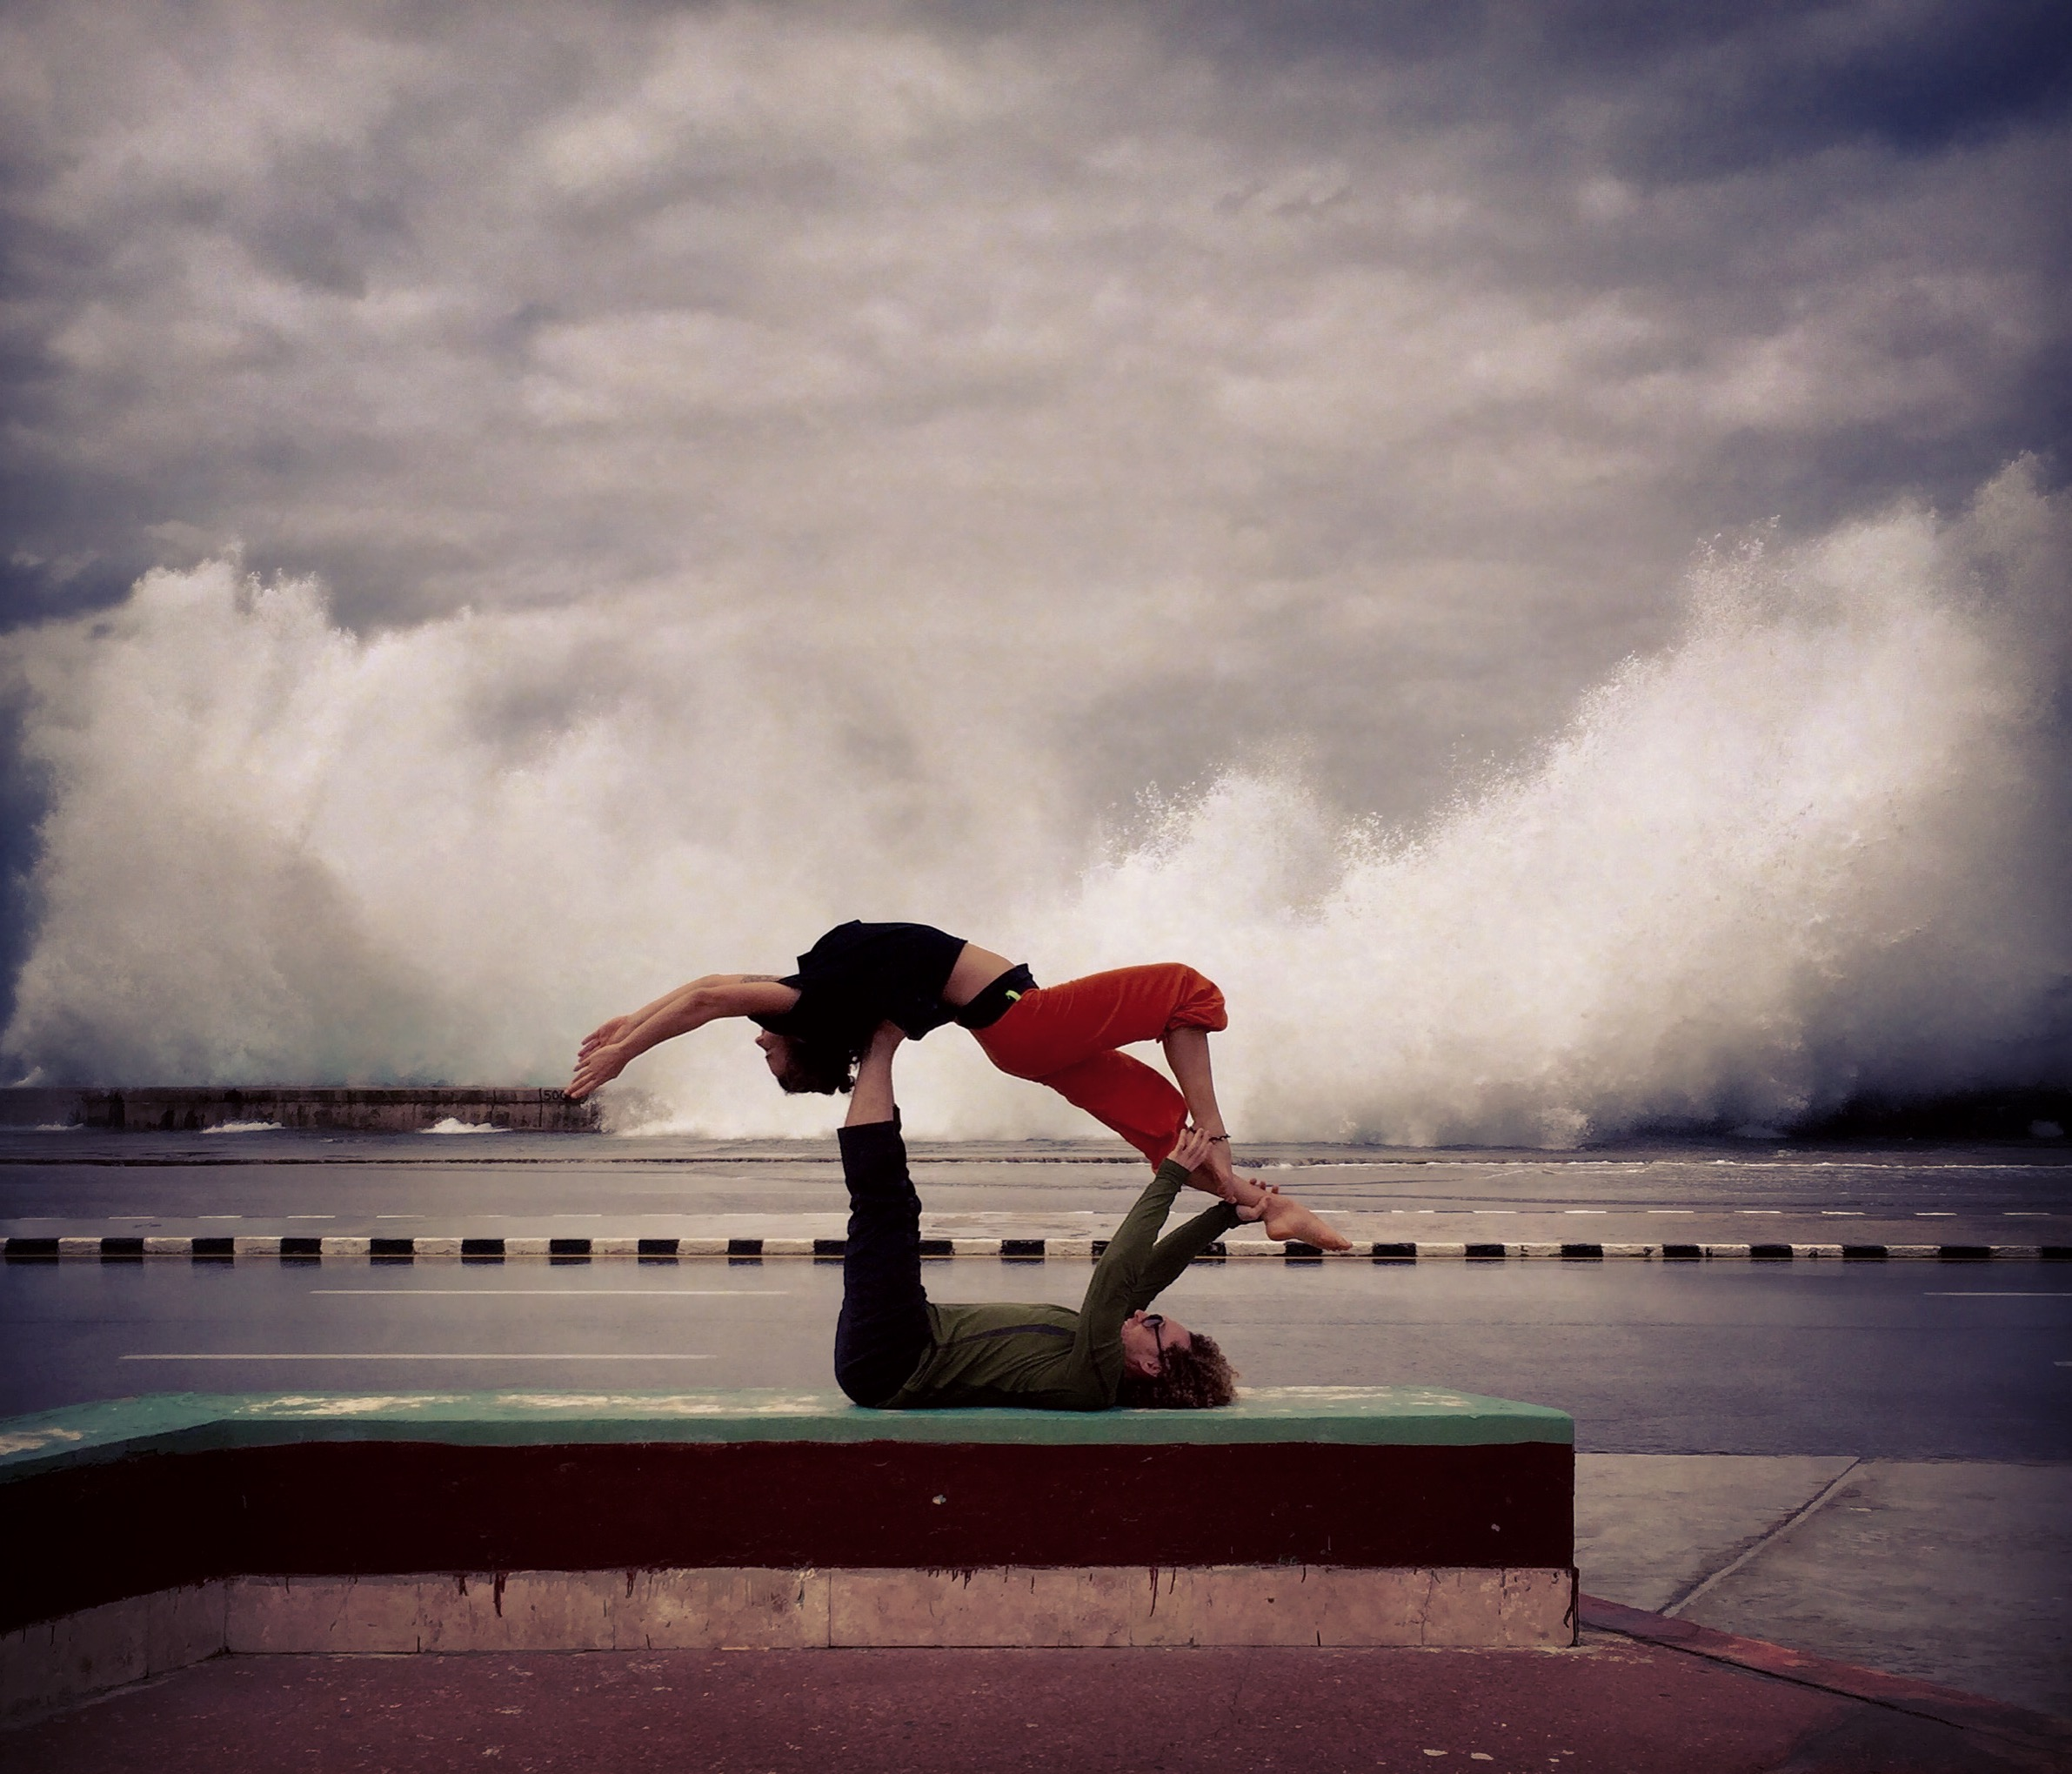 AcroYoga and Waves